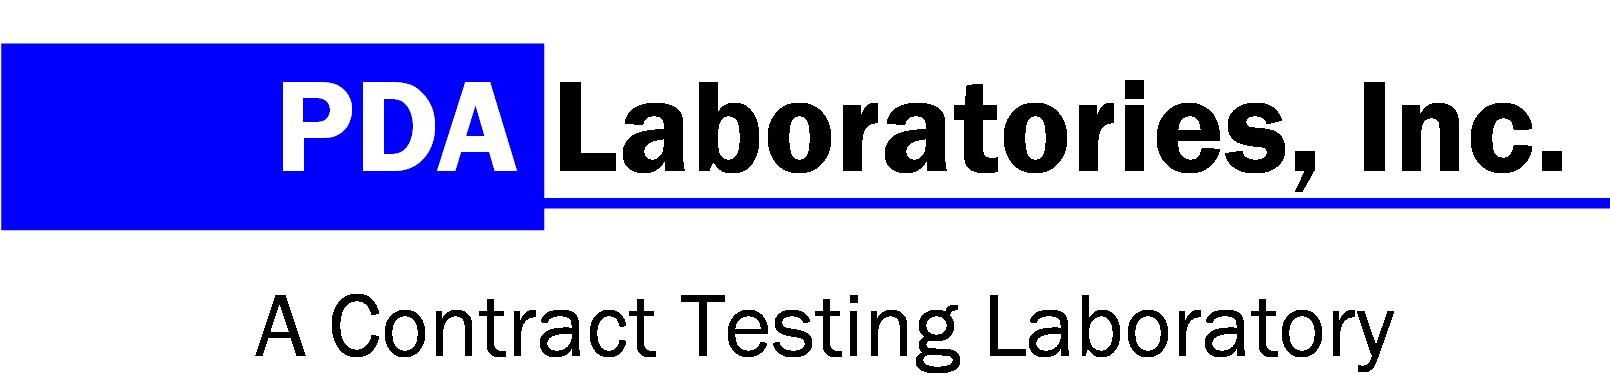 pda laboratories